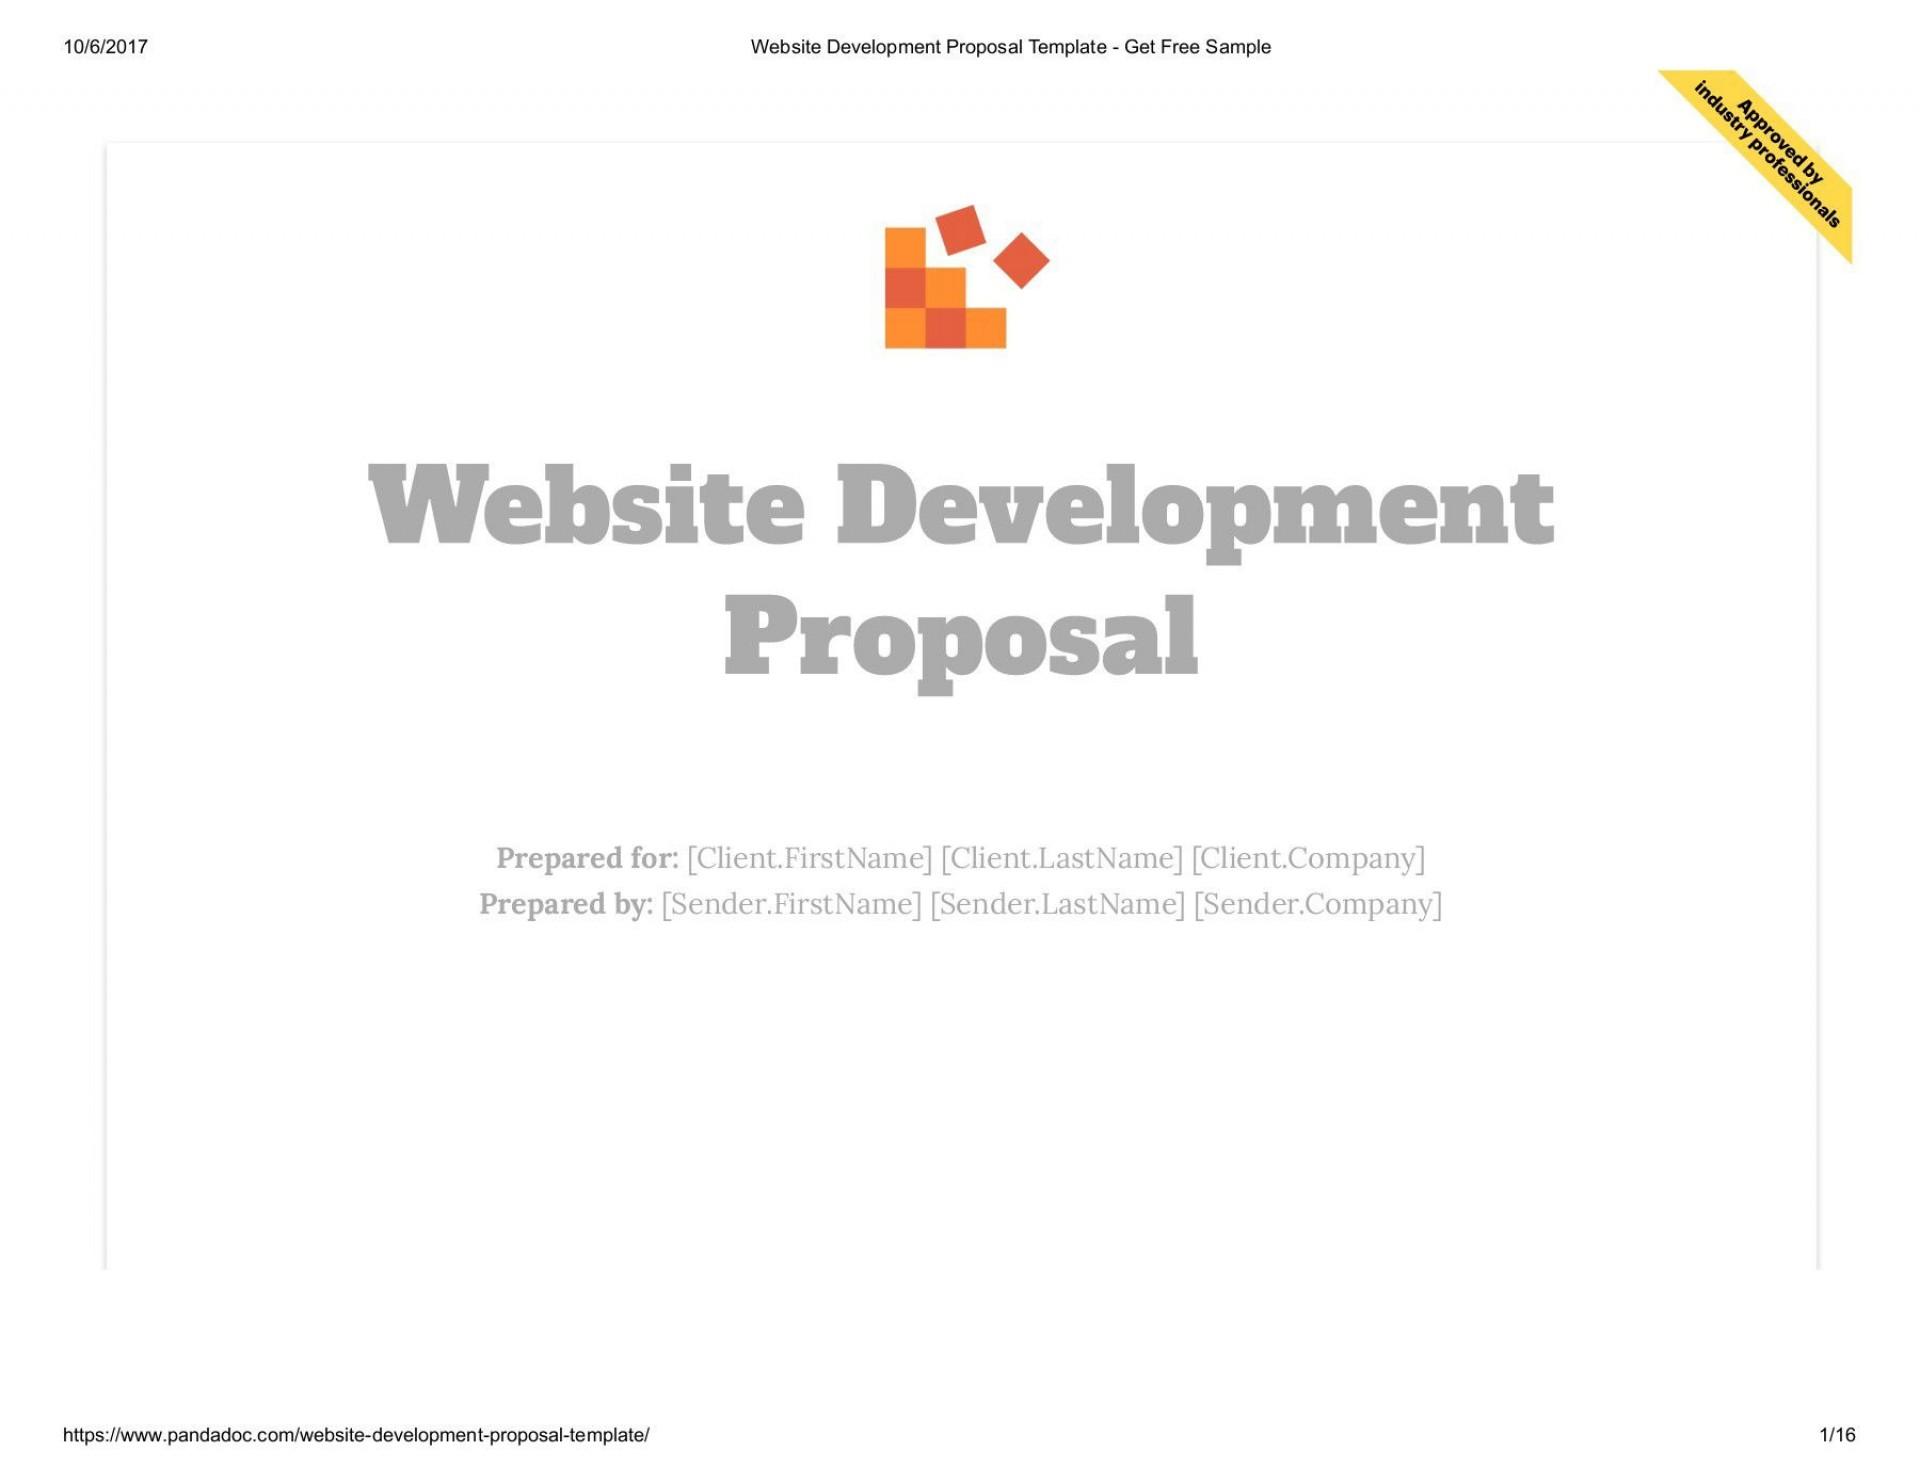 001 Striking Website Development Proposal Format High Def  Web Template Pdf Sample Ecommerce1920